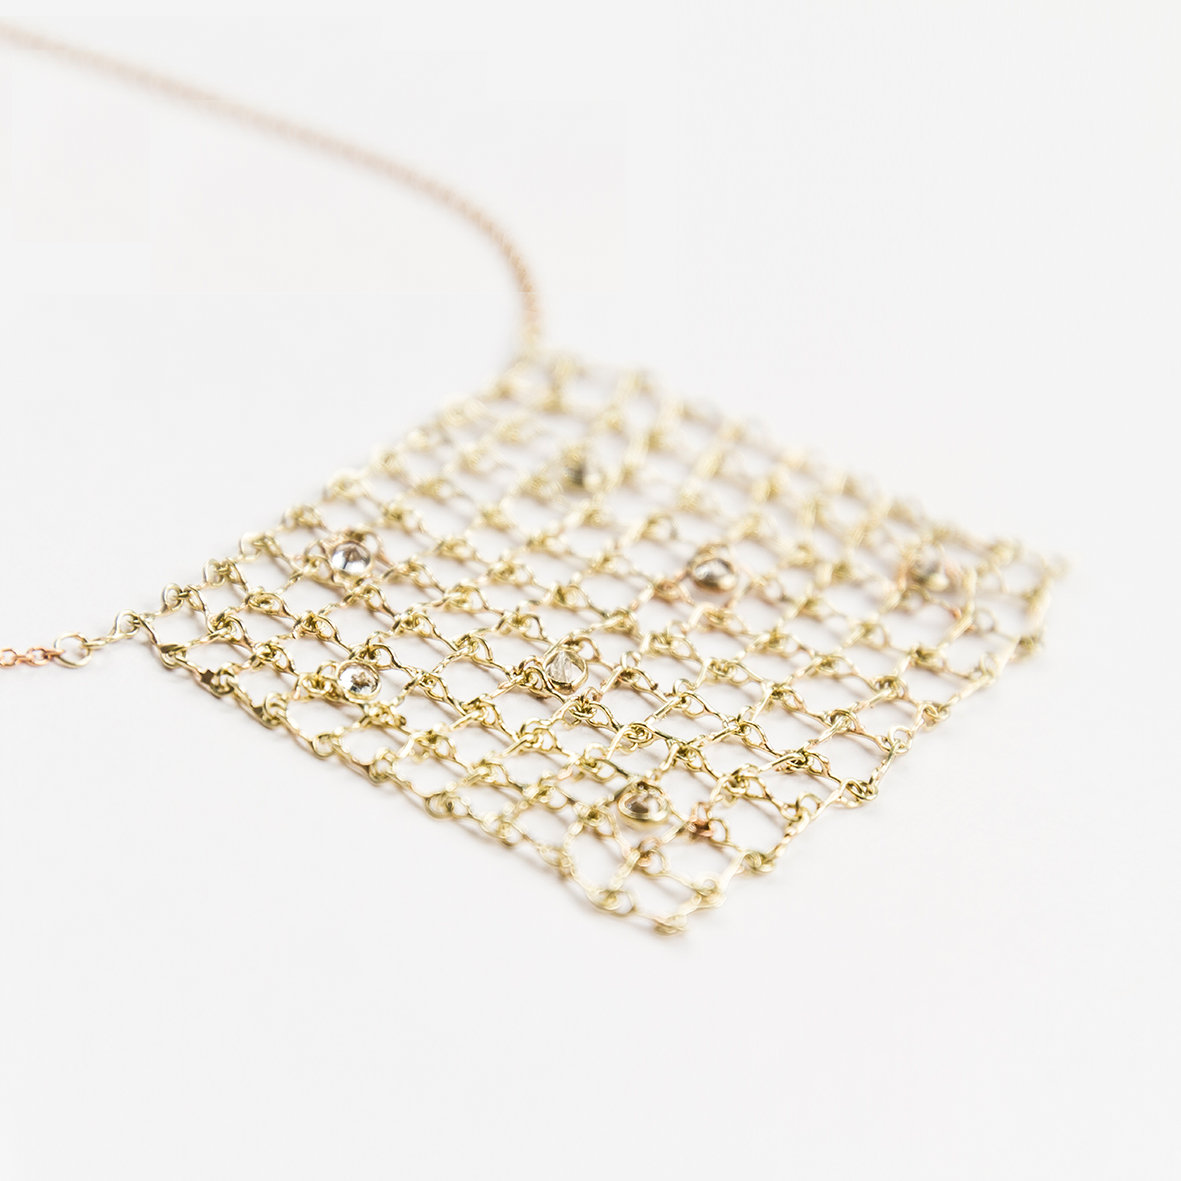 2. OONA_philo_principal_sapphire square net necklace